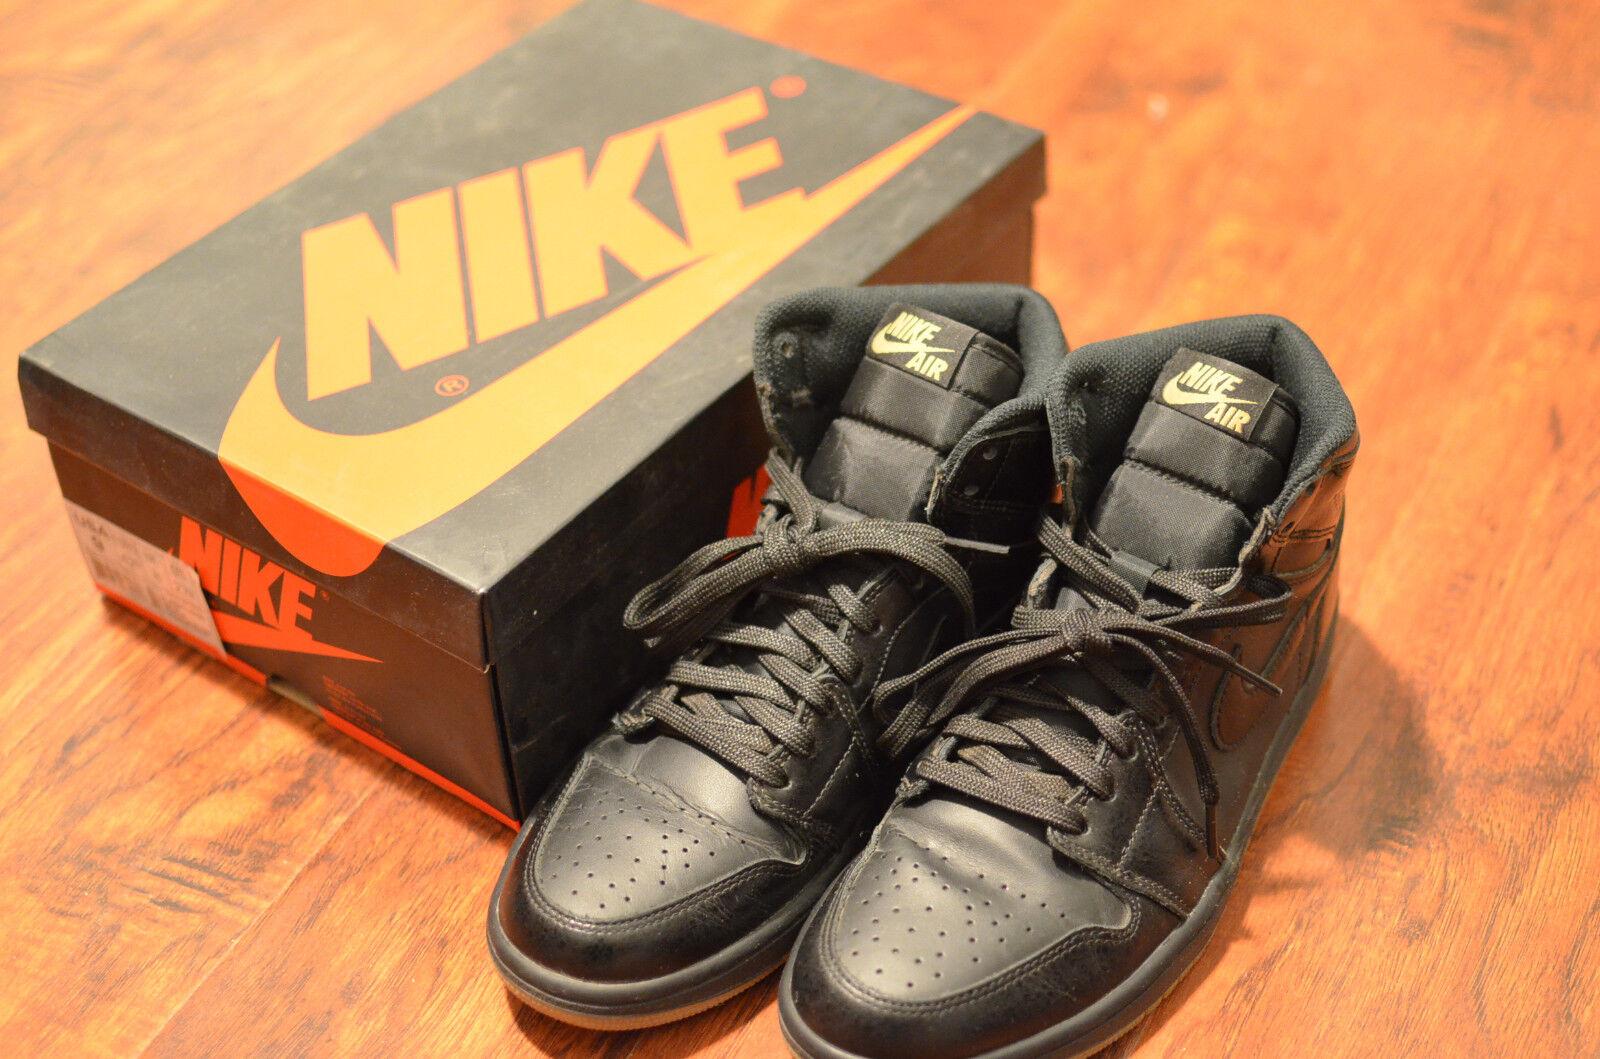 #LotsOfPics, EE. UU. Sz 9 para Hombre 1s Nike Jordan 1s Hombre Alta Negro Goma Bball Zapatos limpiado 14f14f